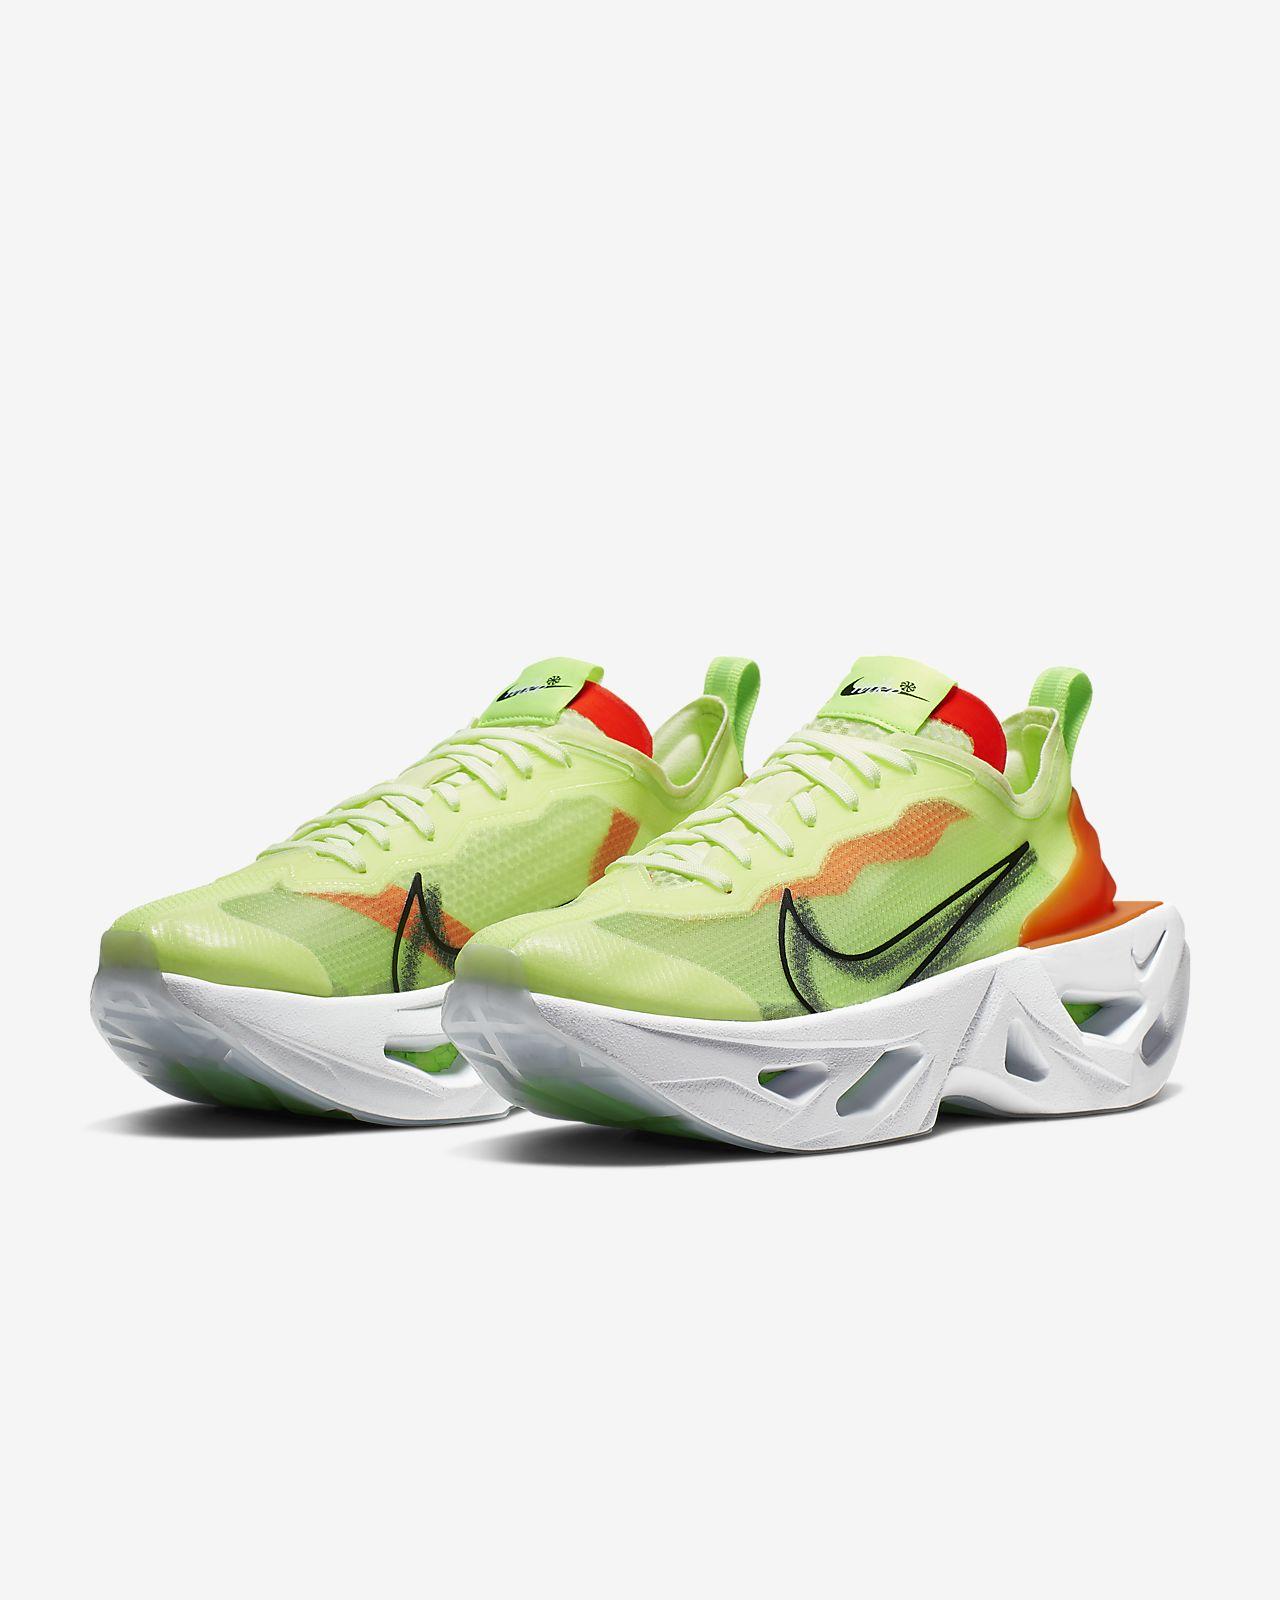 Nike Shox NZ Women's Shoe. I NEED THESE NOW   Hot Bod in 2019